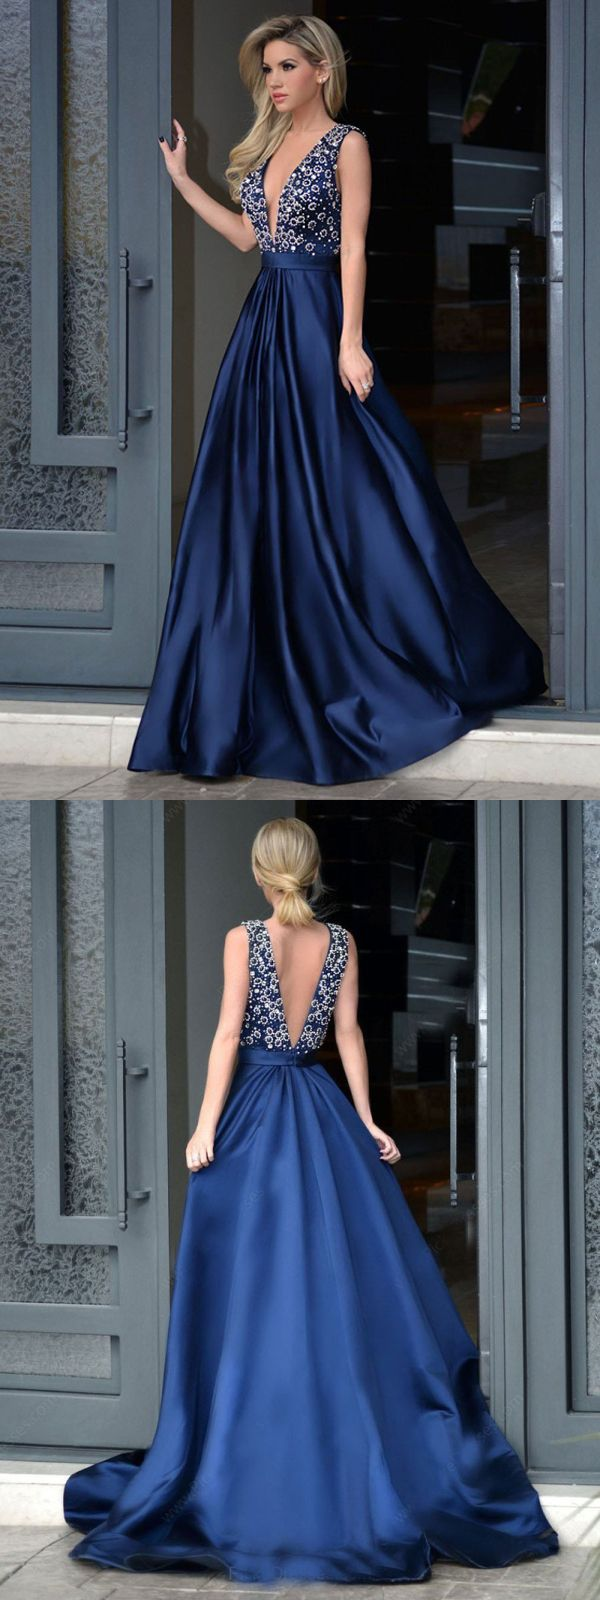 A line prom dress simple modest beautiful cheap long prom dress